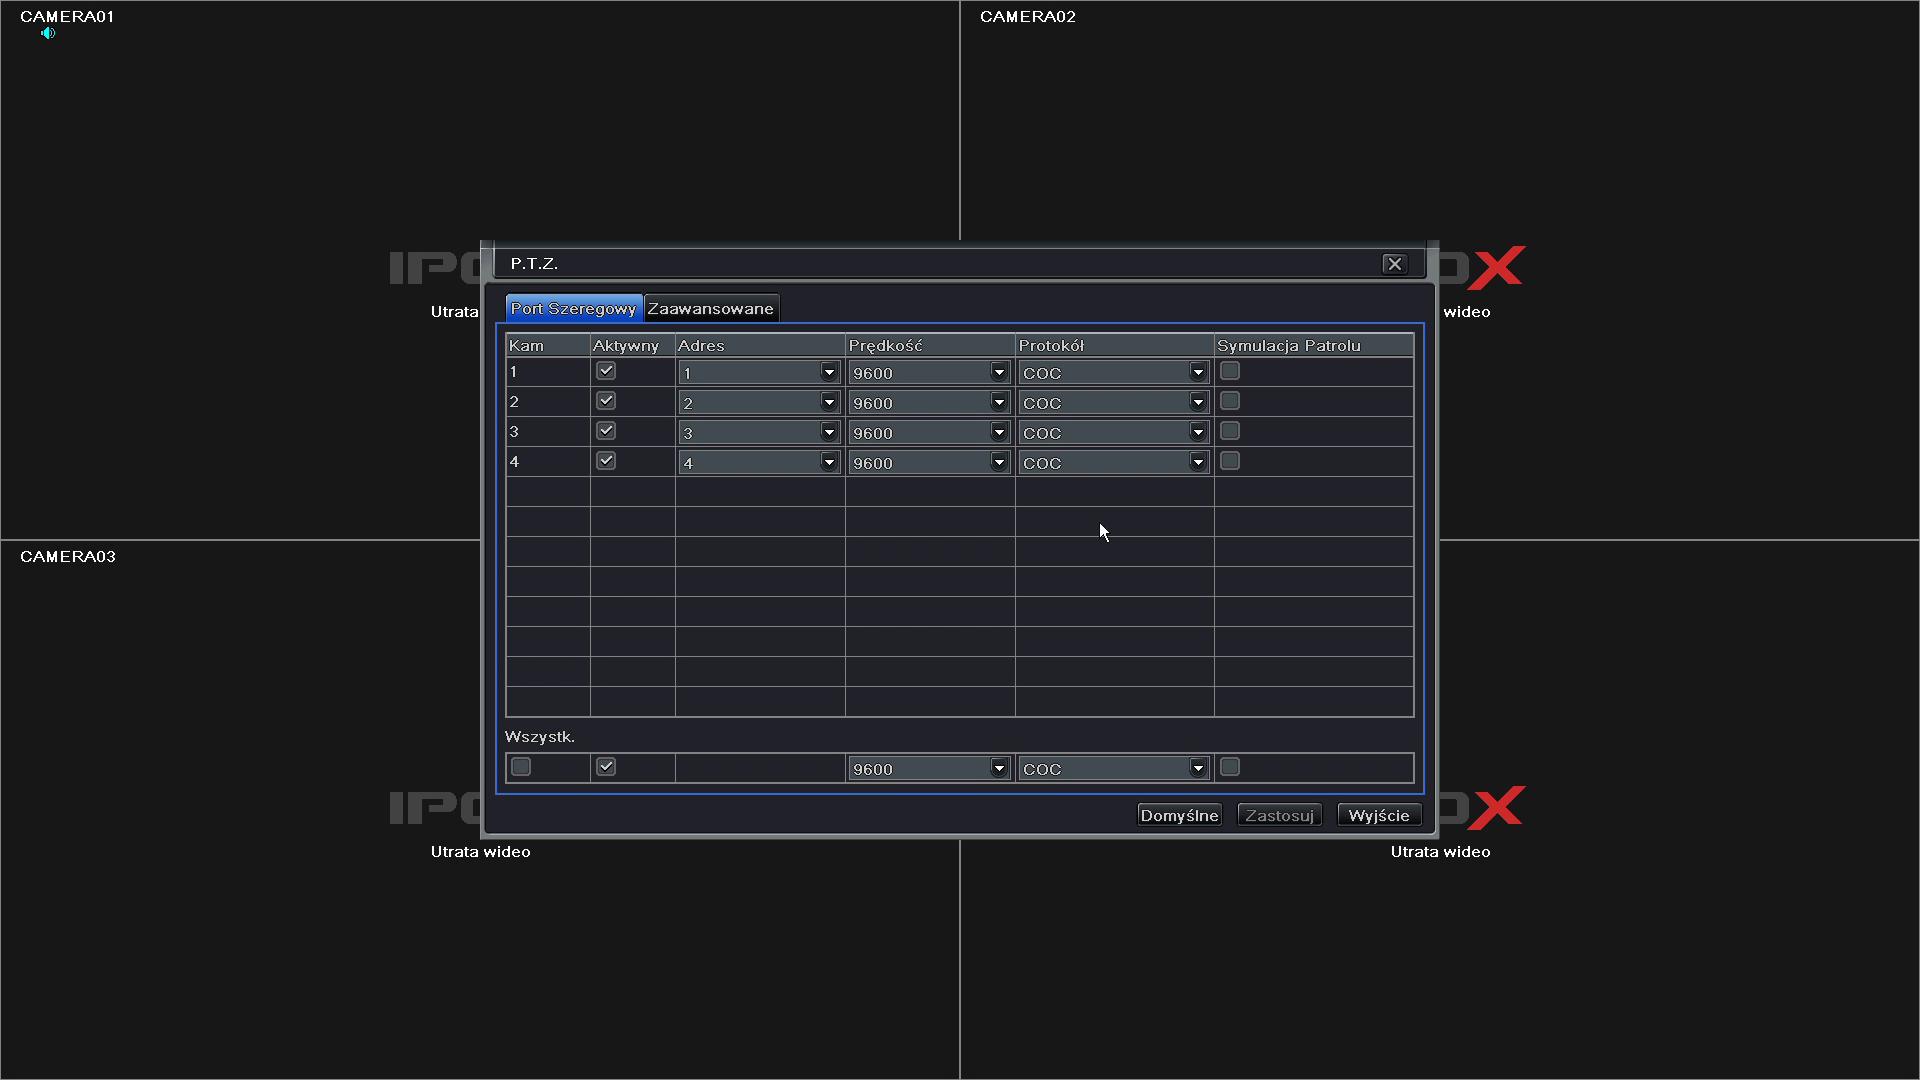 Zdalny dostęp do menu OSD w kamerach HD-TVI